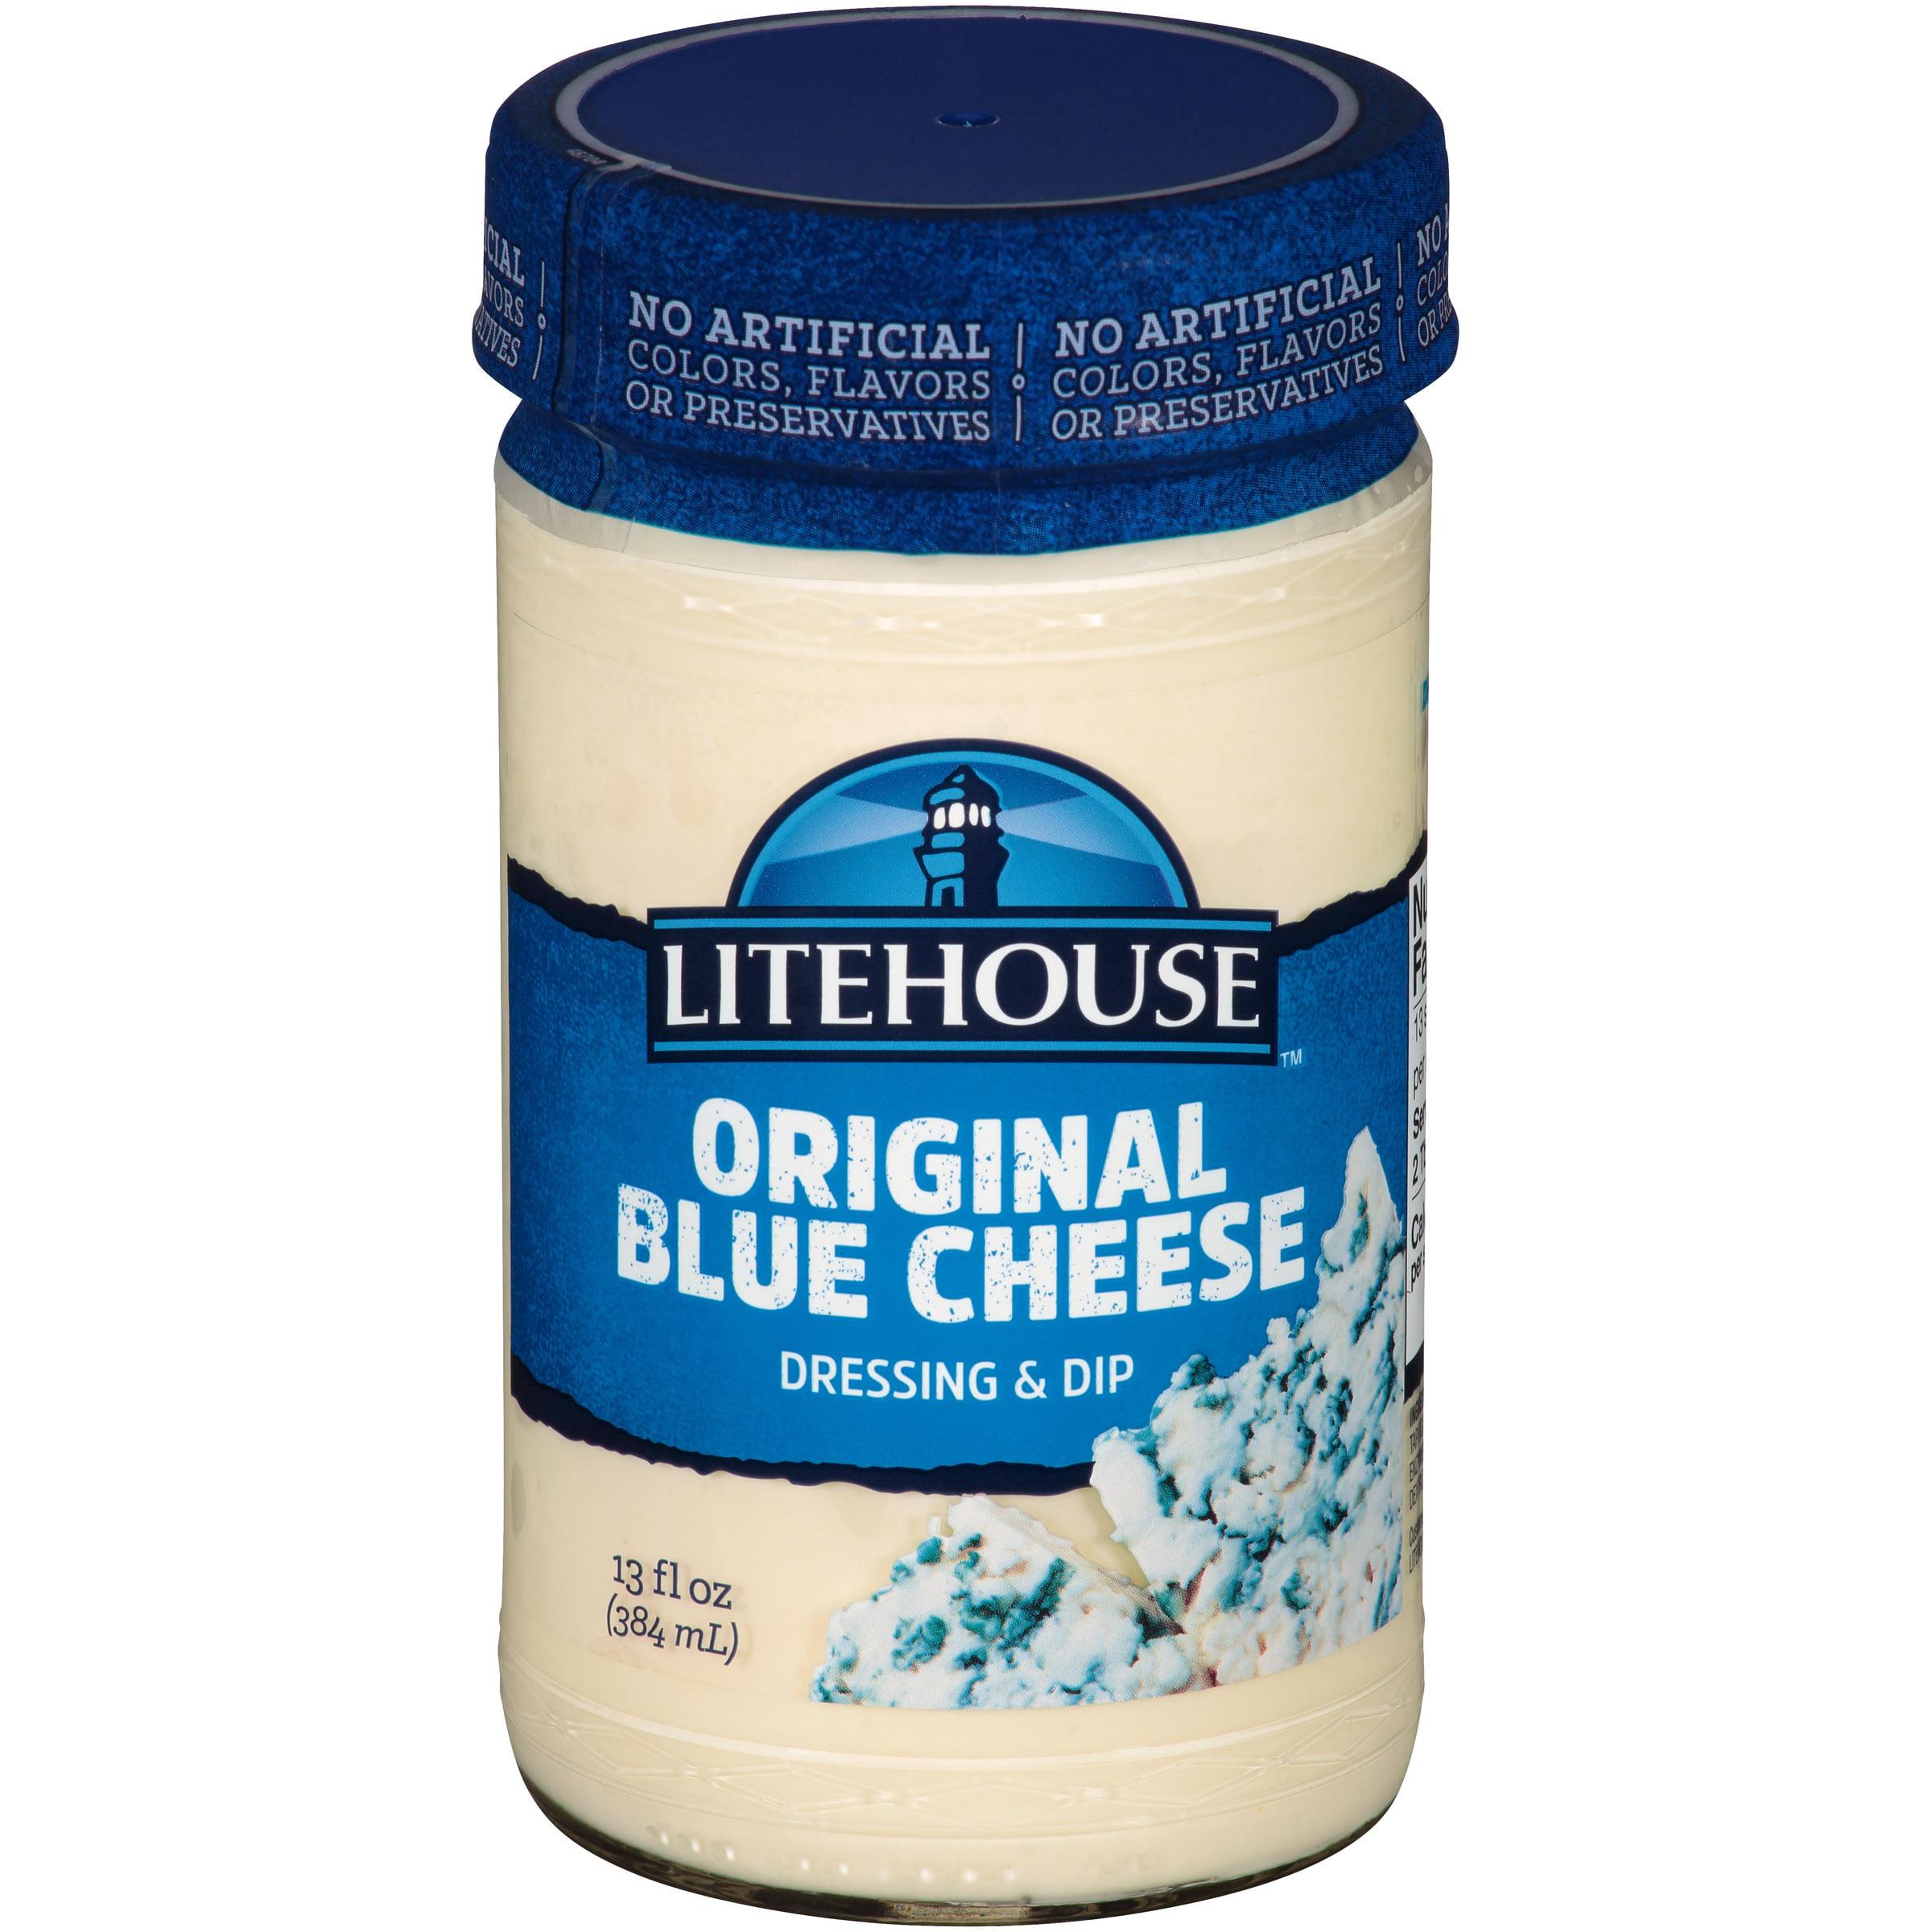 Litehouse Original Bleu Cheese Dressing & Dip 13 Fl Oz Jar